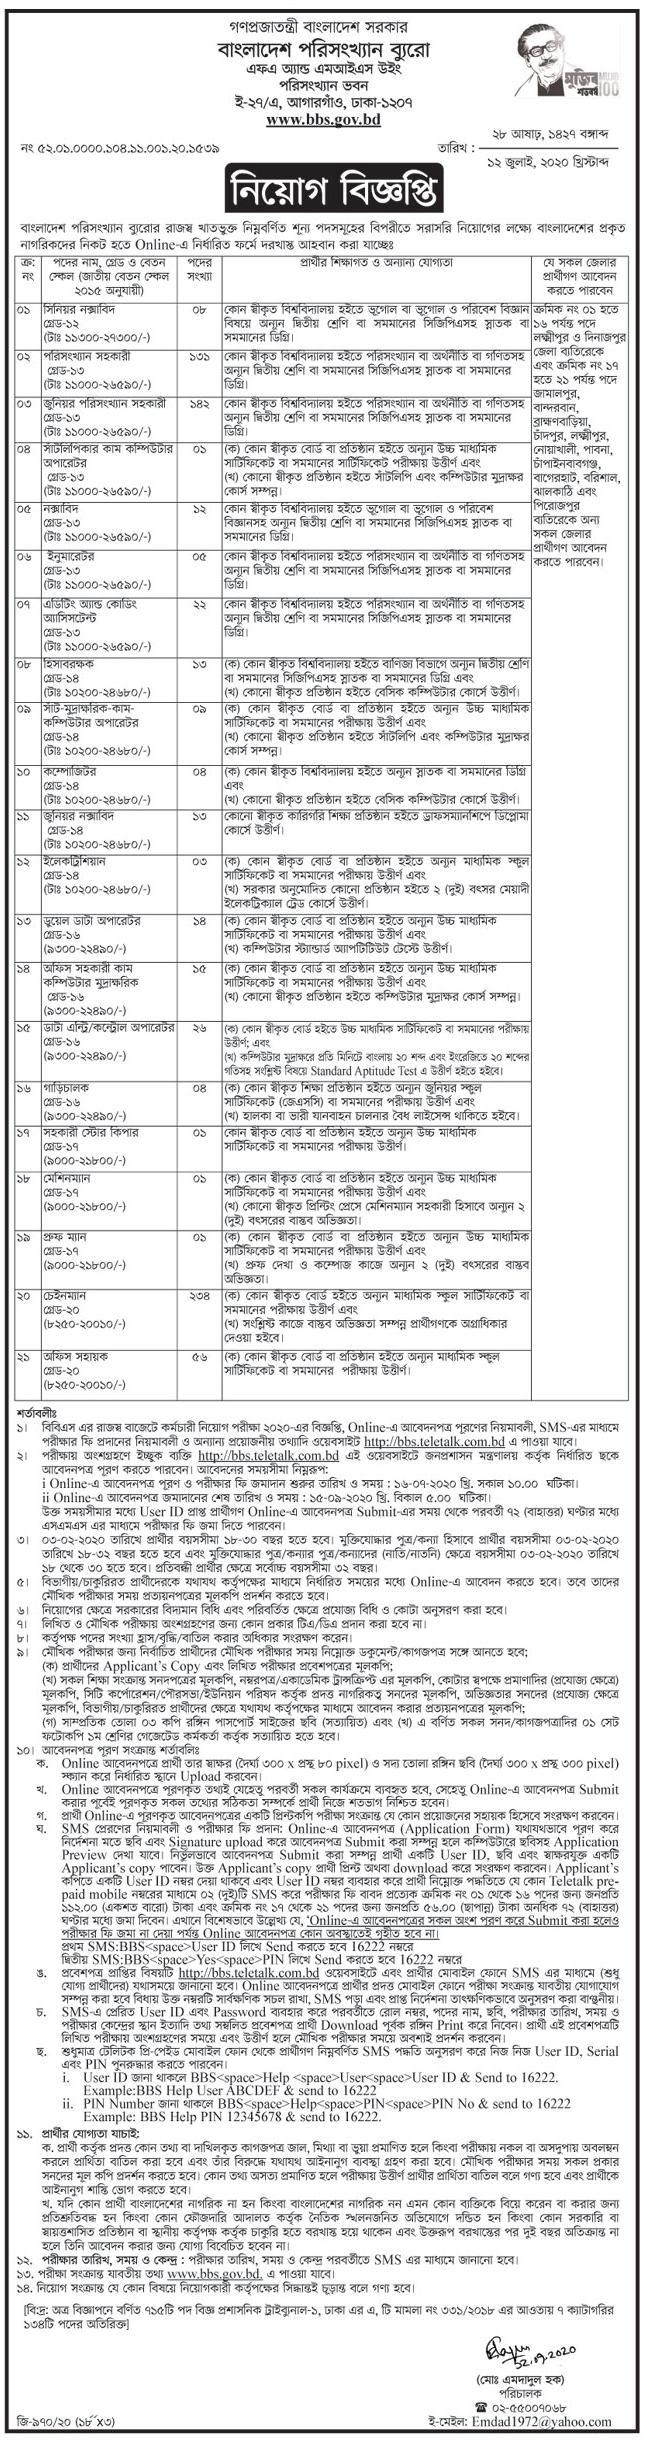 BBS Teletalk BD 2020 - bbs.teletalk.com.bd